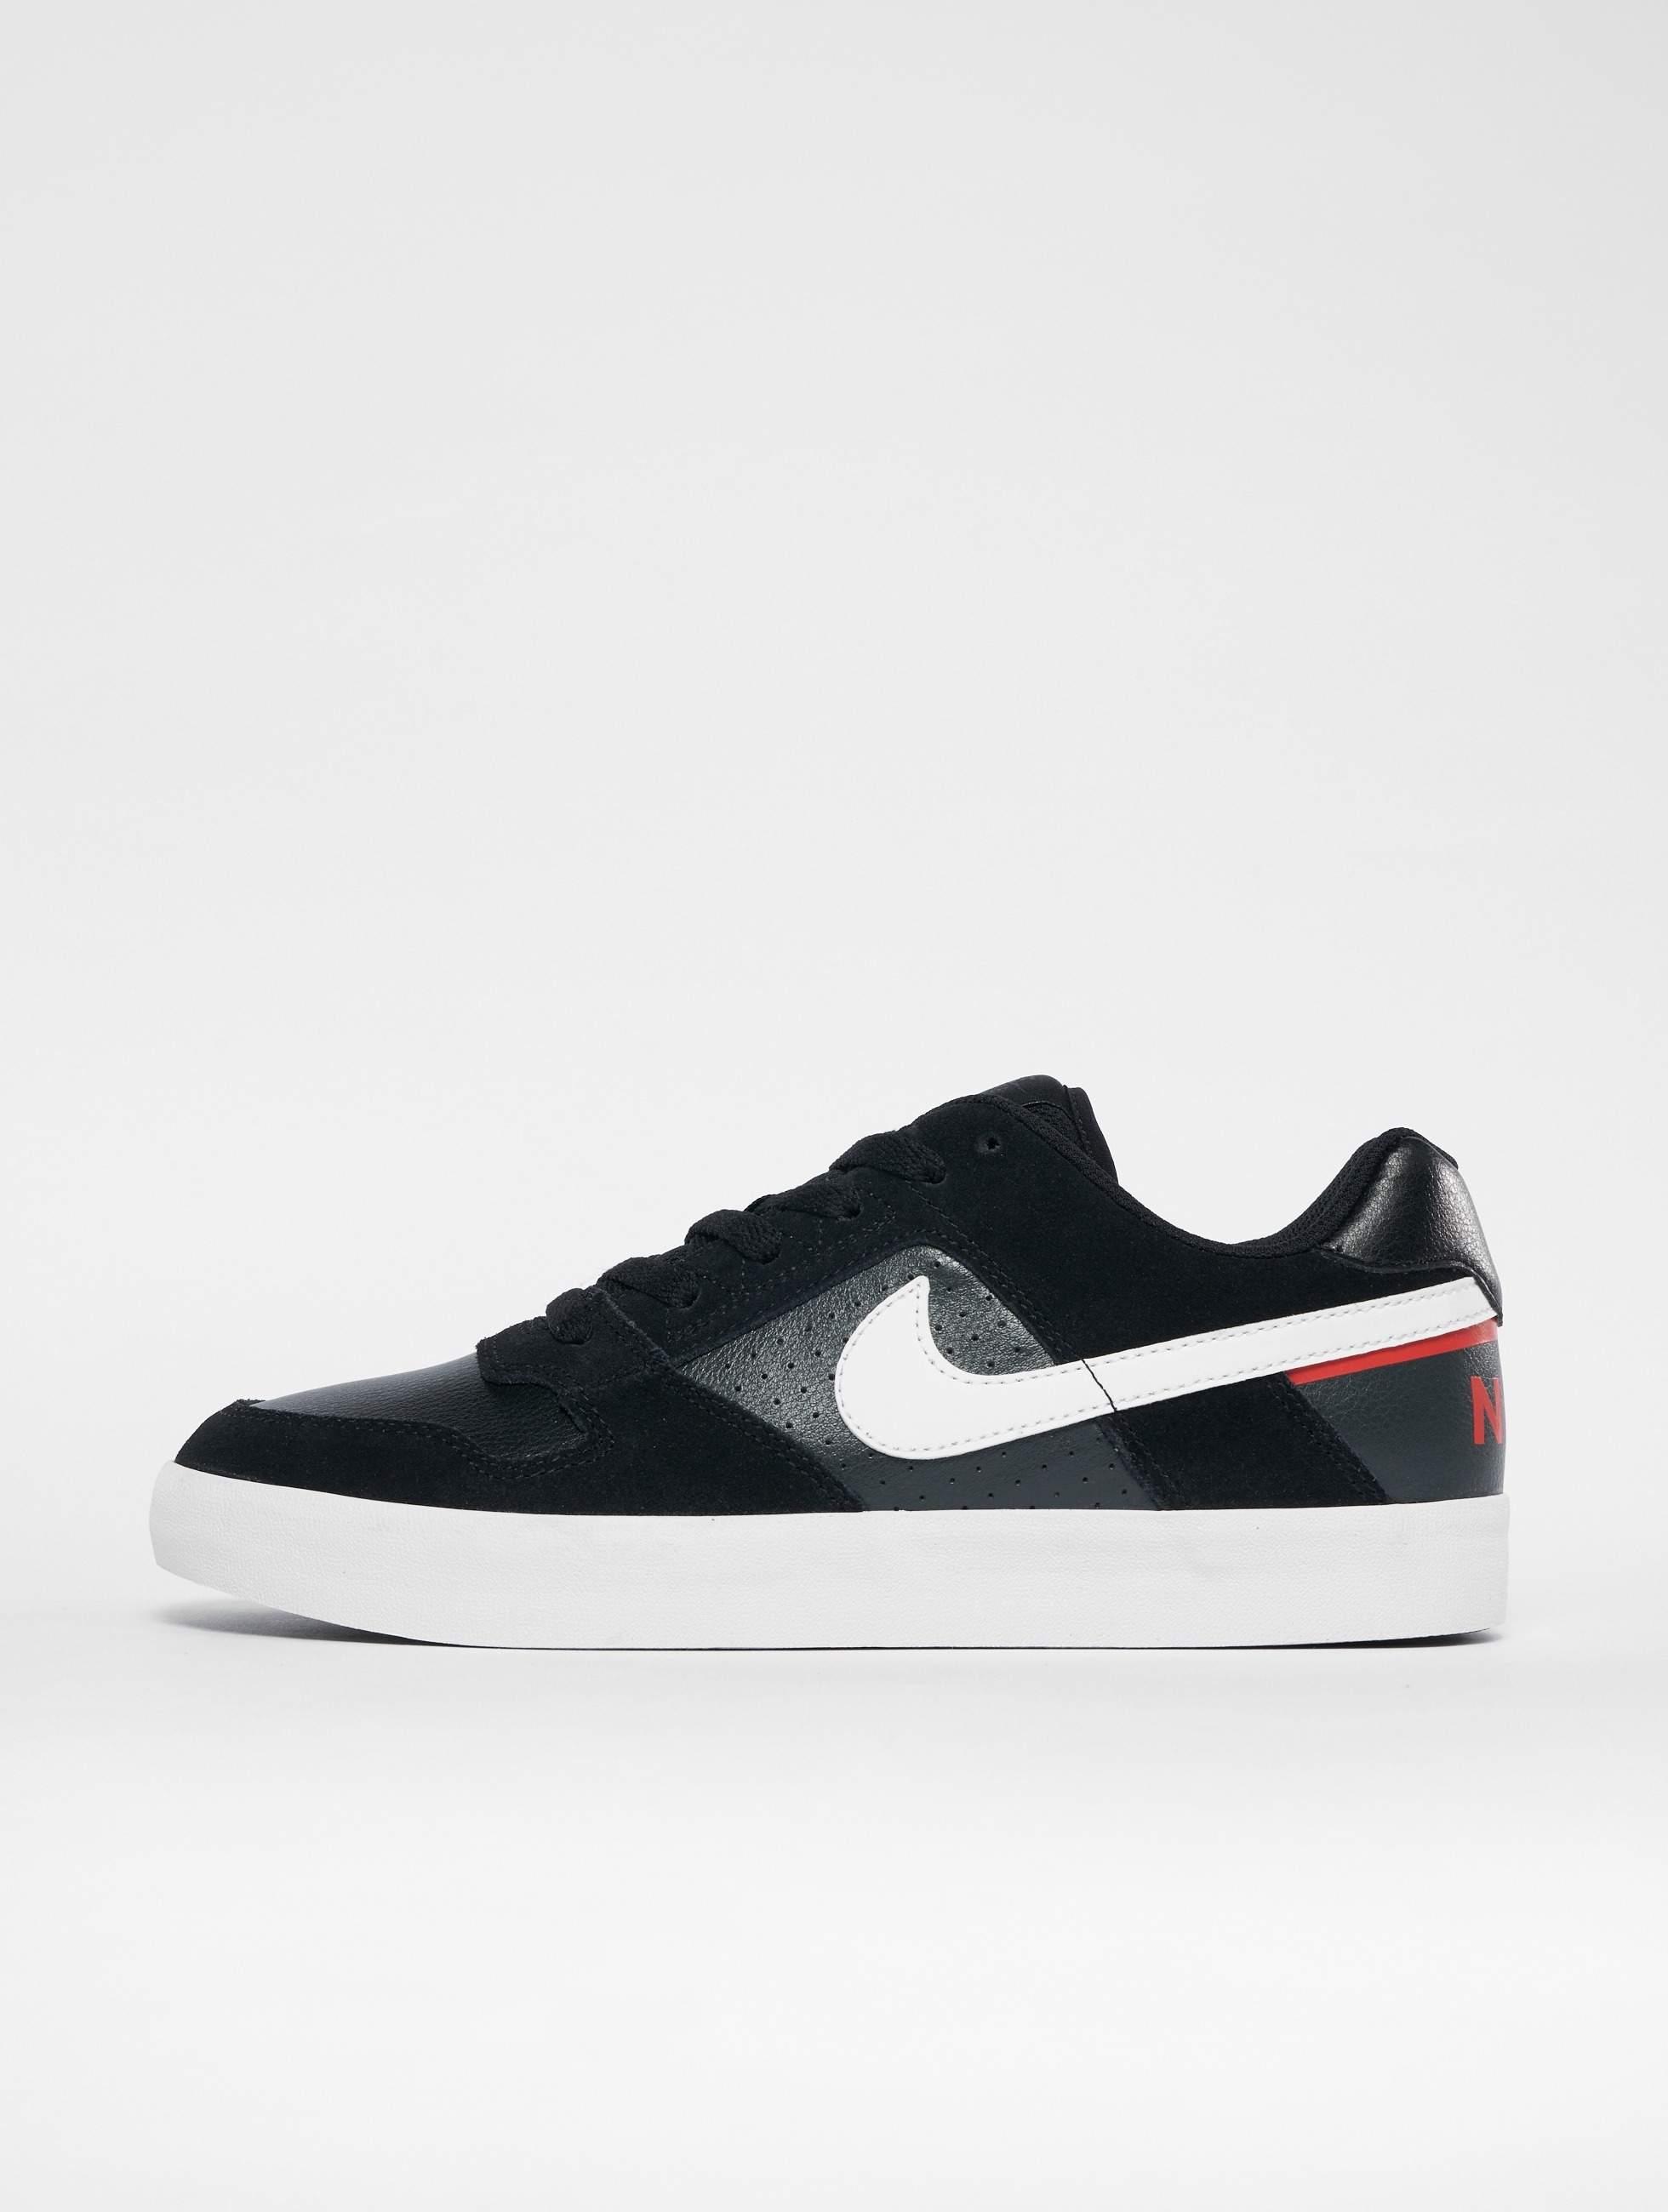 on sale 193f7 429ea Nike SB   Delta Force Vulc noir Homme Baskets 539778